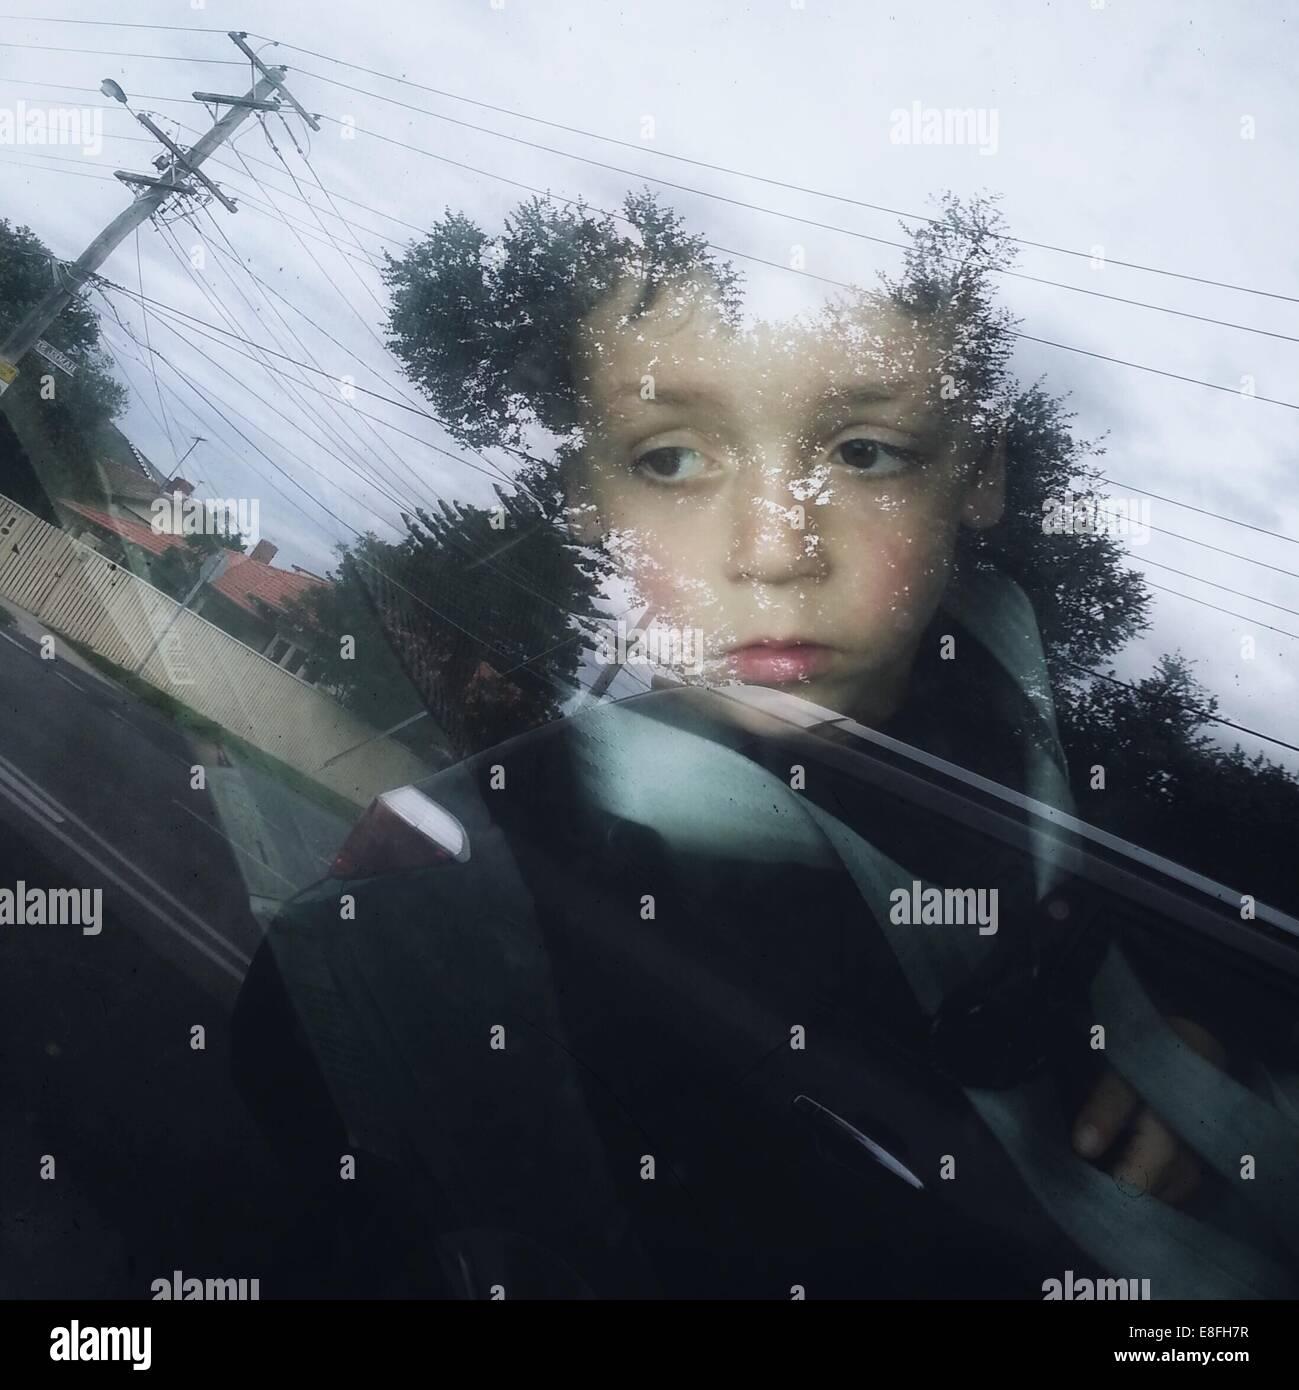 Boy sitting in car seat looking through window - Stock Image